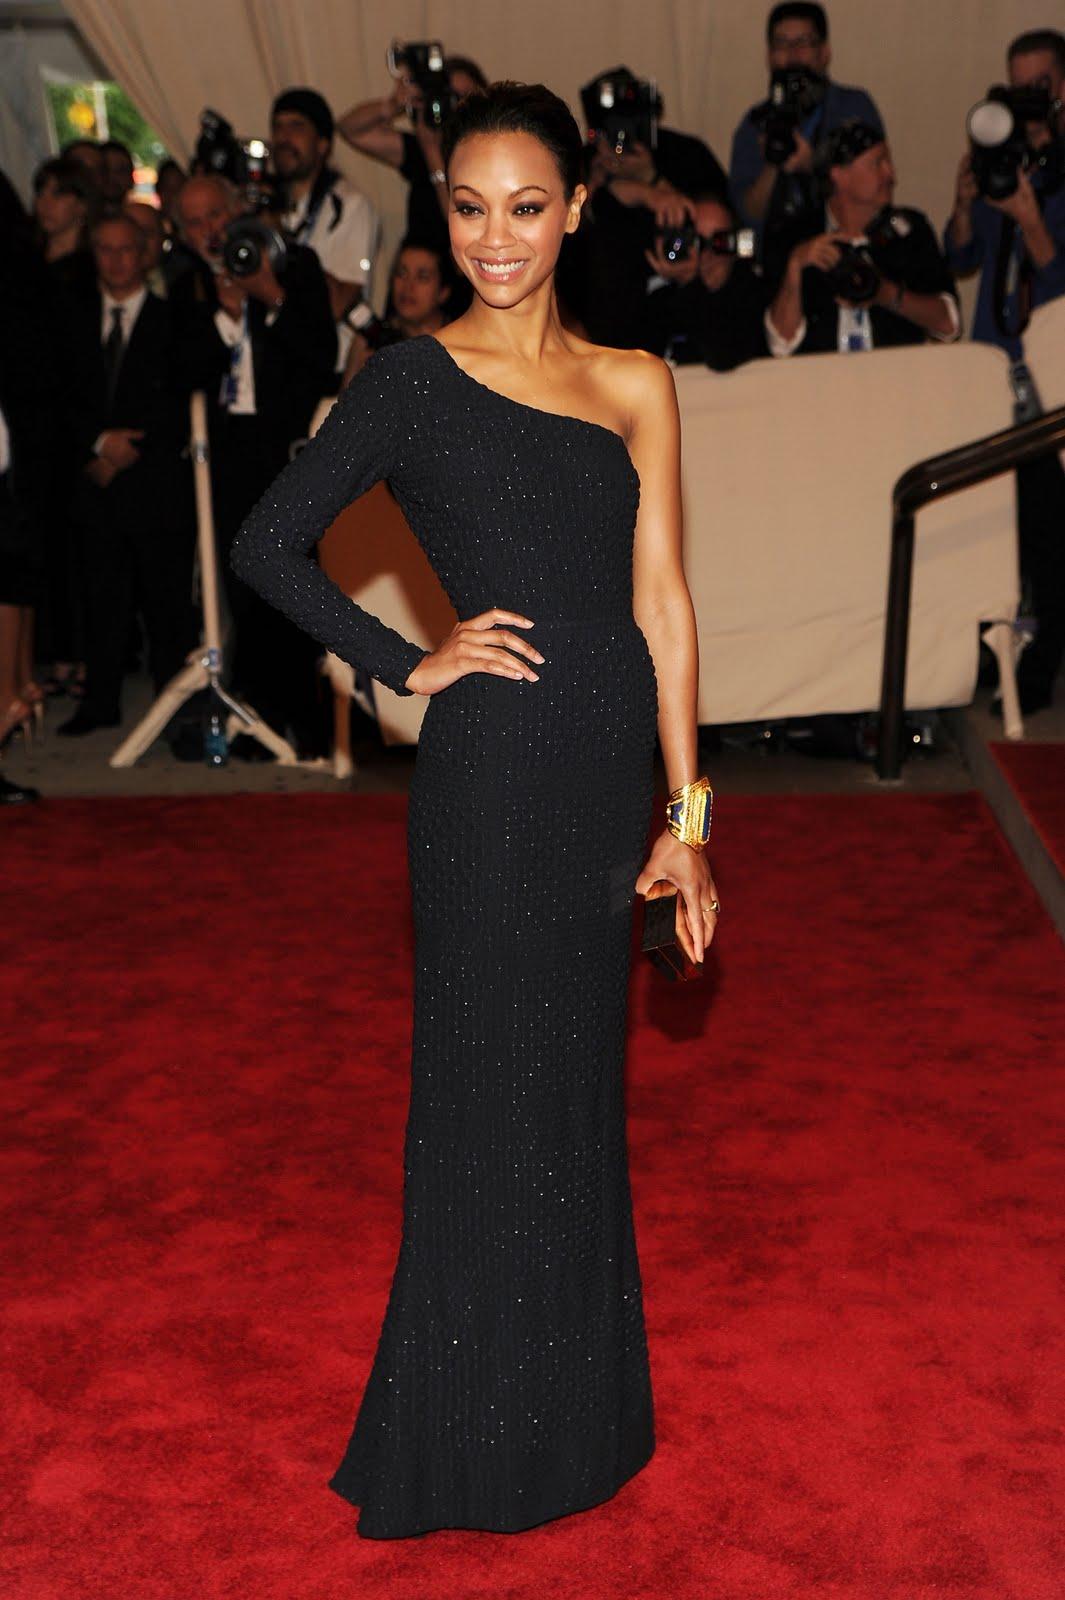 http://4.bp.blogspot.com/_9dA_x389xoo/S9-WHv30Q6I/AAAAAAAAFc8/nfWjmTzAUXc/s1600/zoe+saldana+american+woman+fashioning+a+national+identity+met+gala+tikipeter+celebritycity+012.jpg